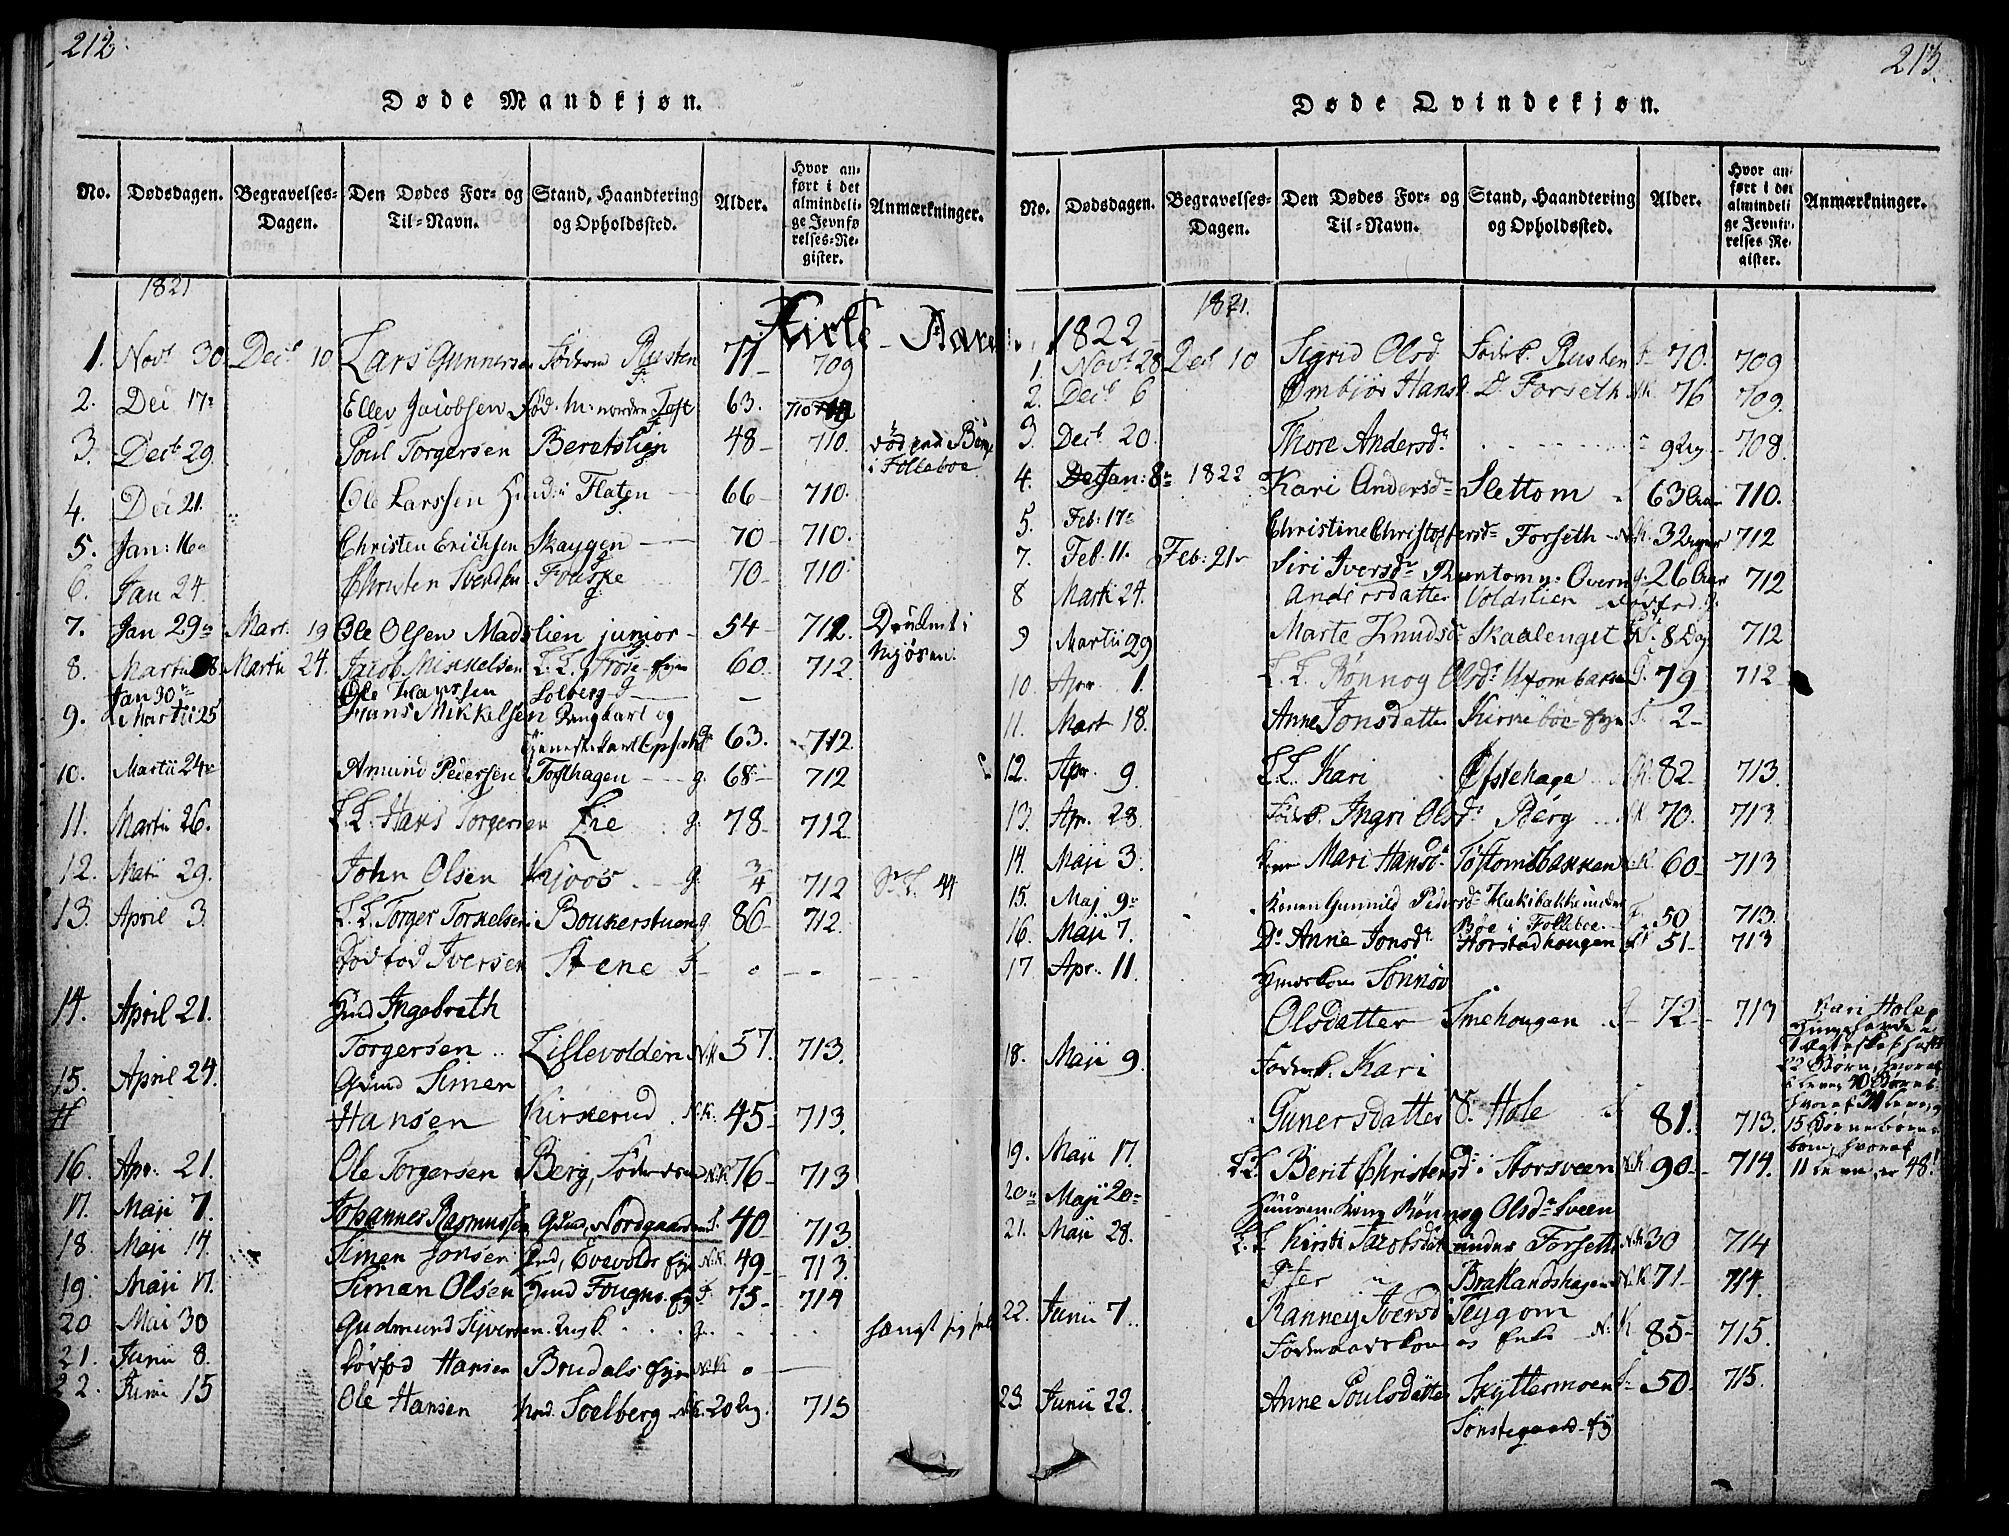 SAH, Gausdal prestekontor, Ministerialbok nr. 5, 1817-1829, s. 212-213